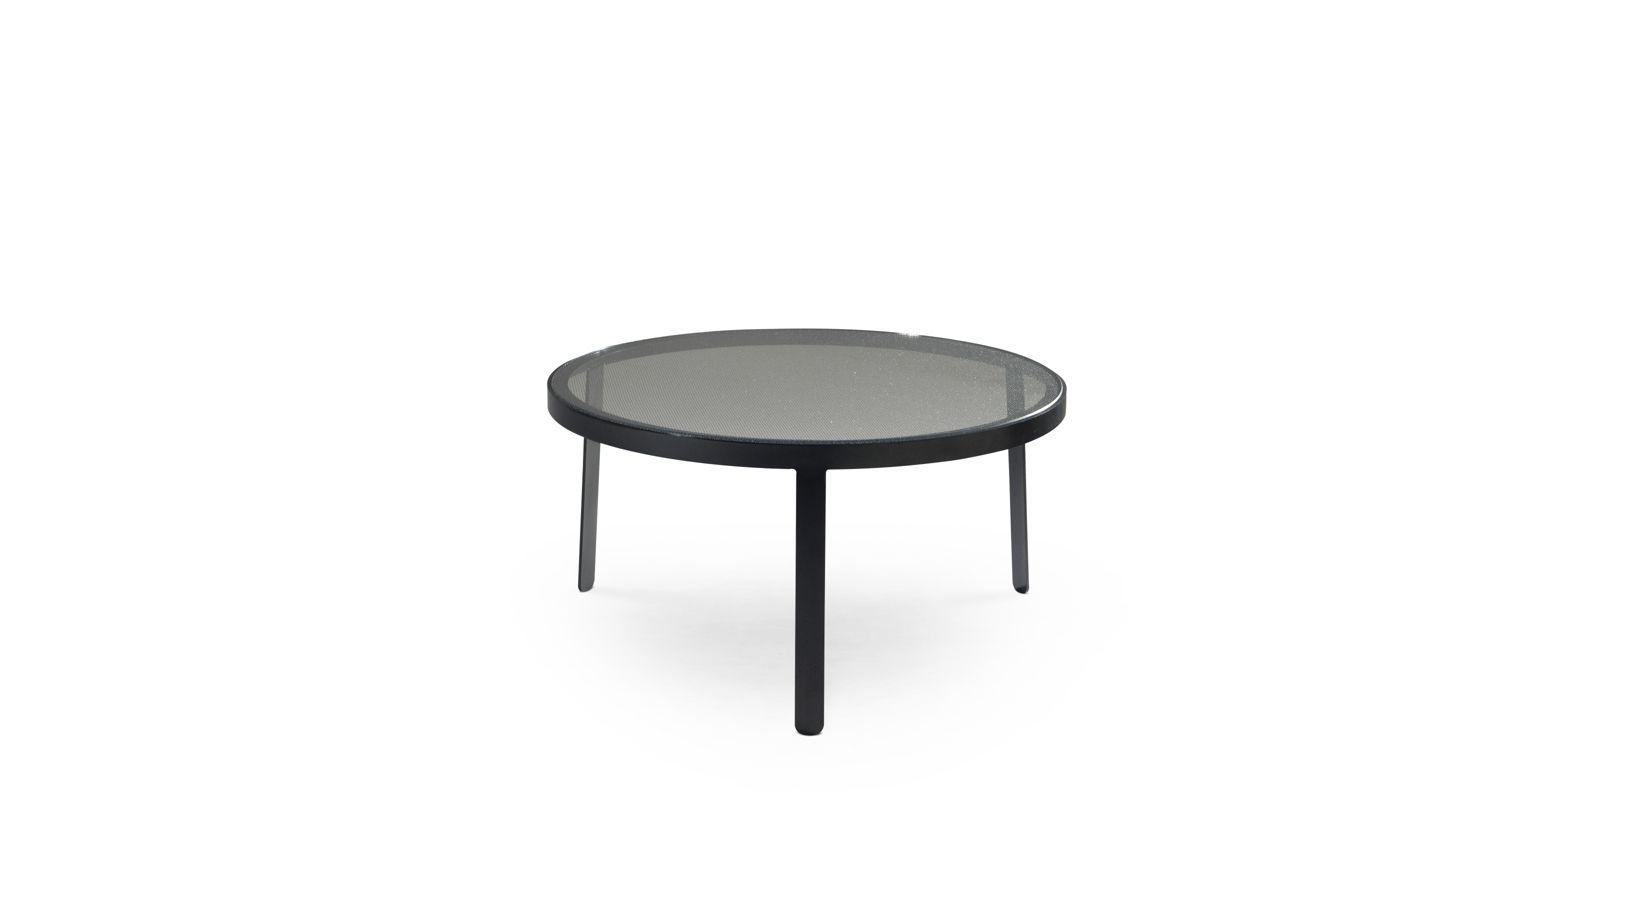 Tavolino fianco divano biz roche bobois - Tavolino divano ...